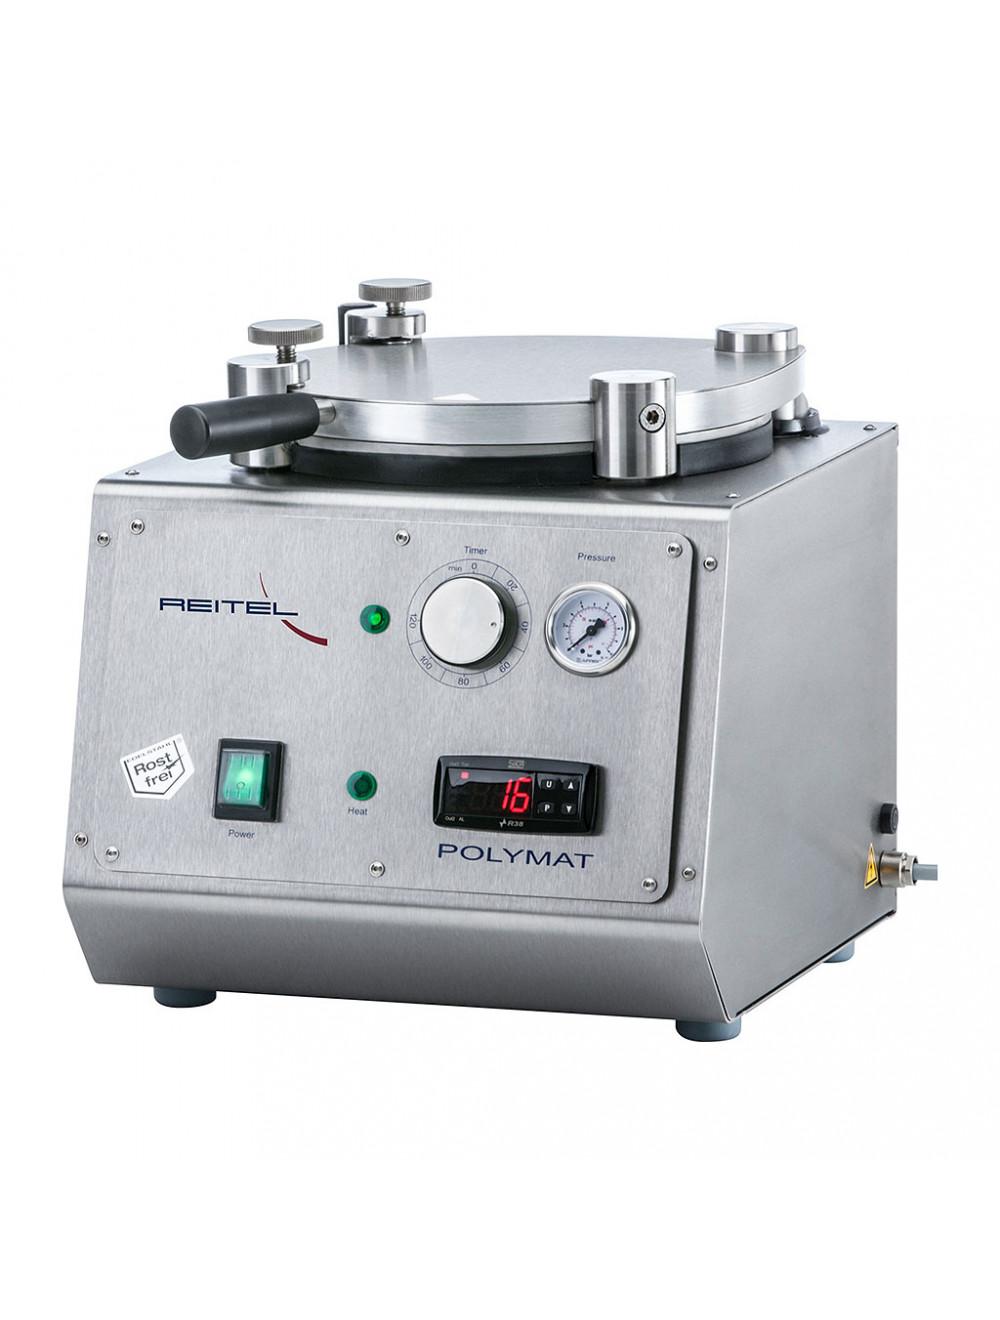 Das Produkt Reitel POLYMAT Polymerisationsgerät 18301000 aus dem Global-dent online shop.